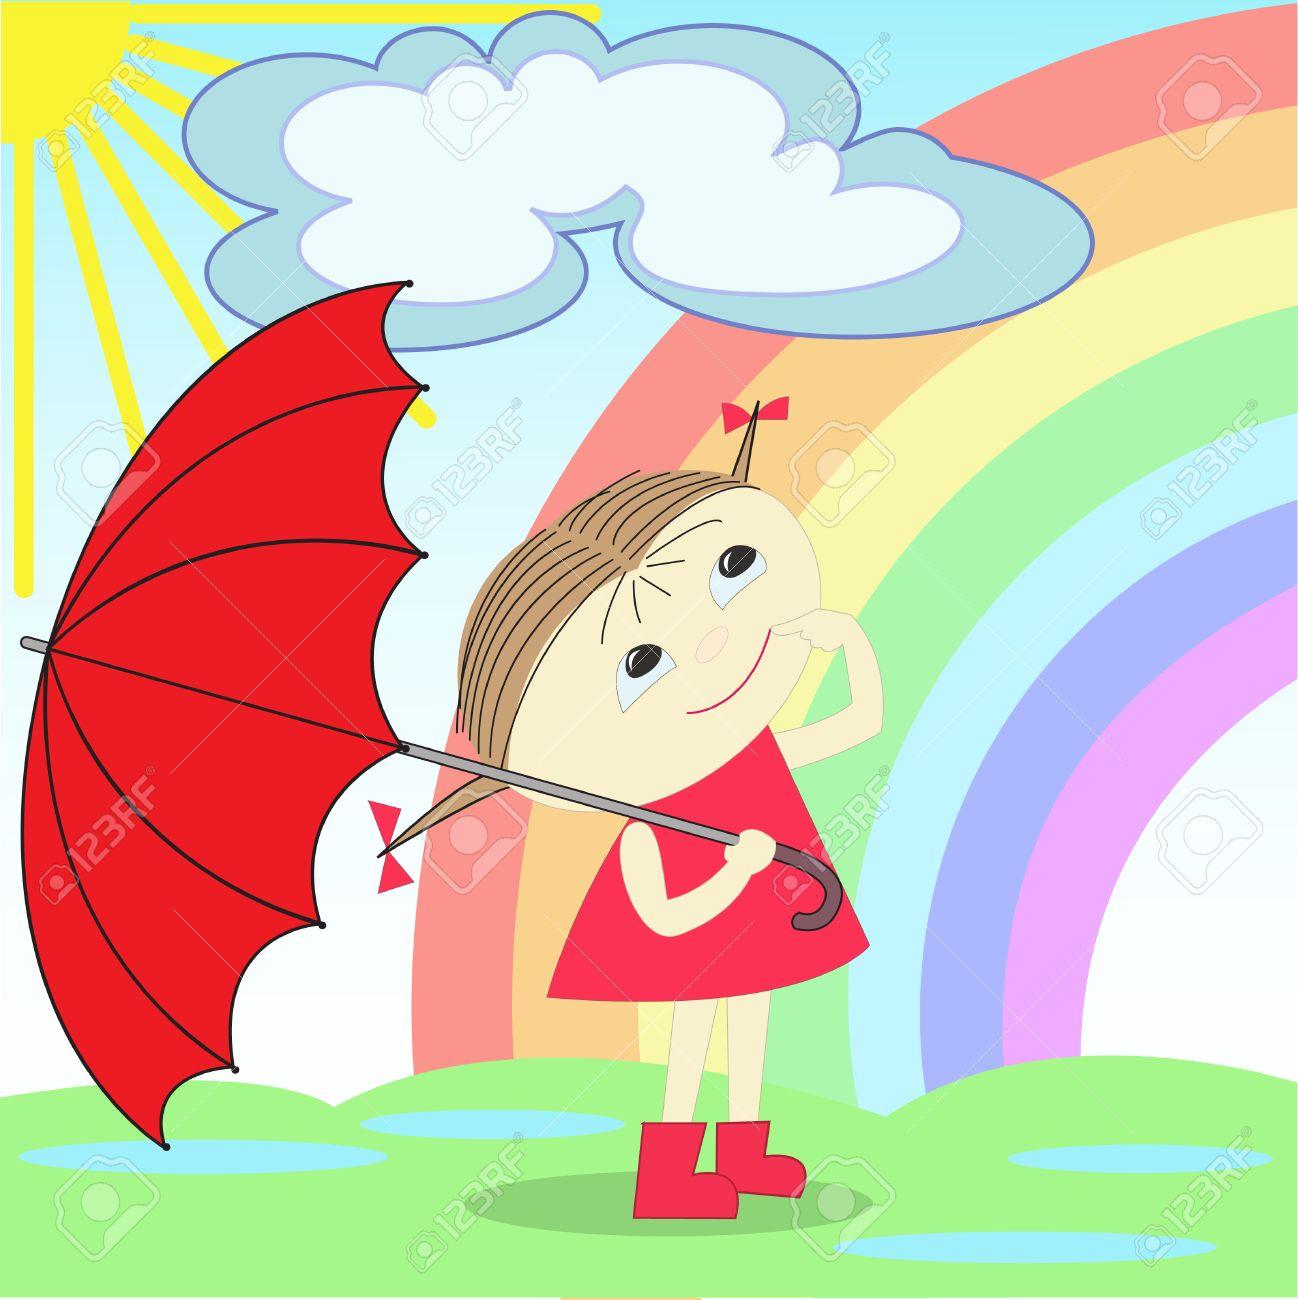 Alone girl in the rain clipart.